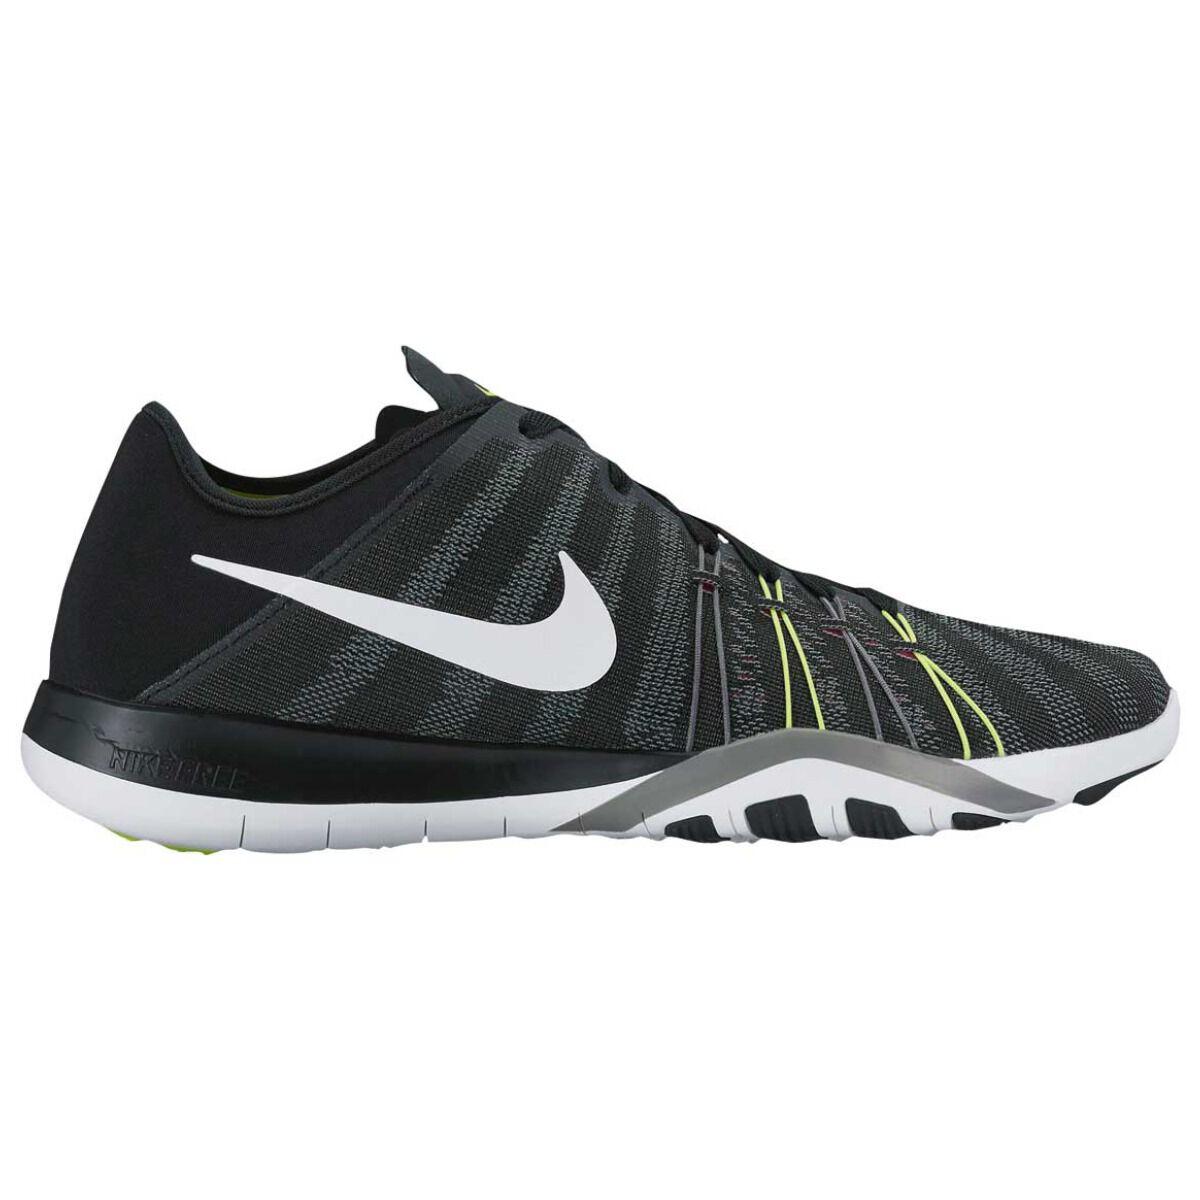 b2bab6be789c ... where can i buy nike free trainer 6 womens training shoes black white  us 6.5 black